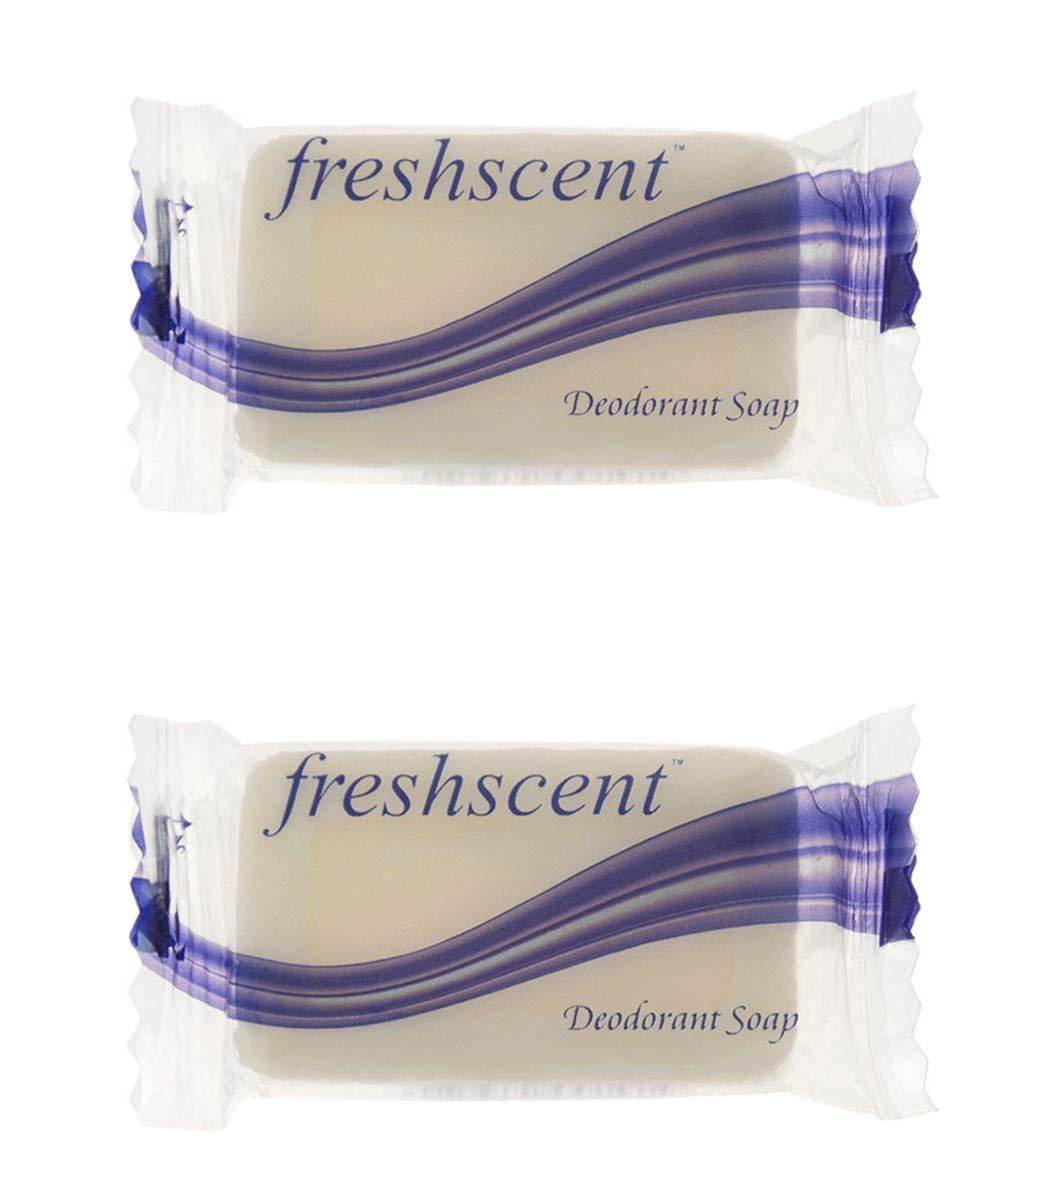 1000 Pieces - Wholesale Freshscent .35 oz Deodorant Soap - Bulk Case Travel Size Hygiene Toiletries